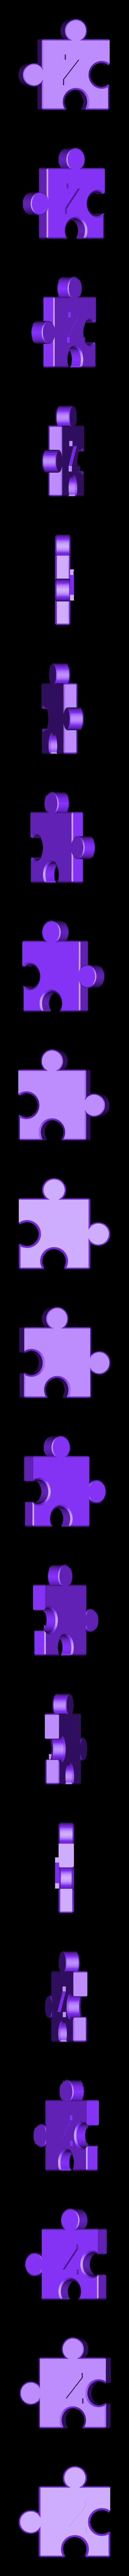 Z.stl Download free STL file Jigsaw Letters, English Alphabet • 3D printing design, LGBU